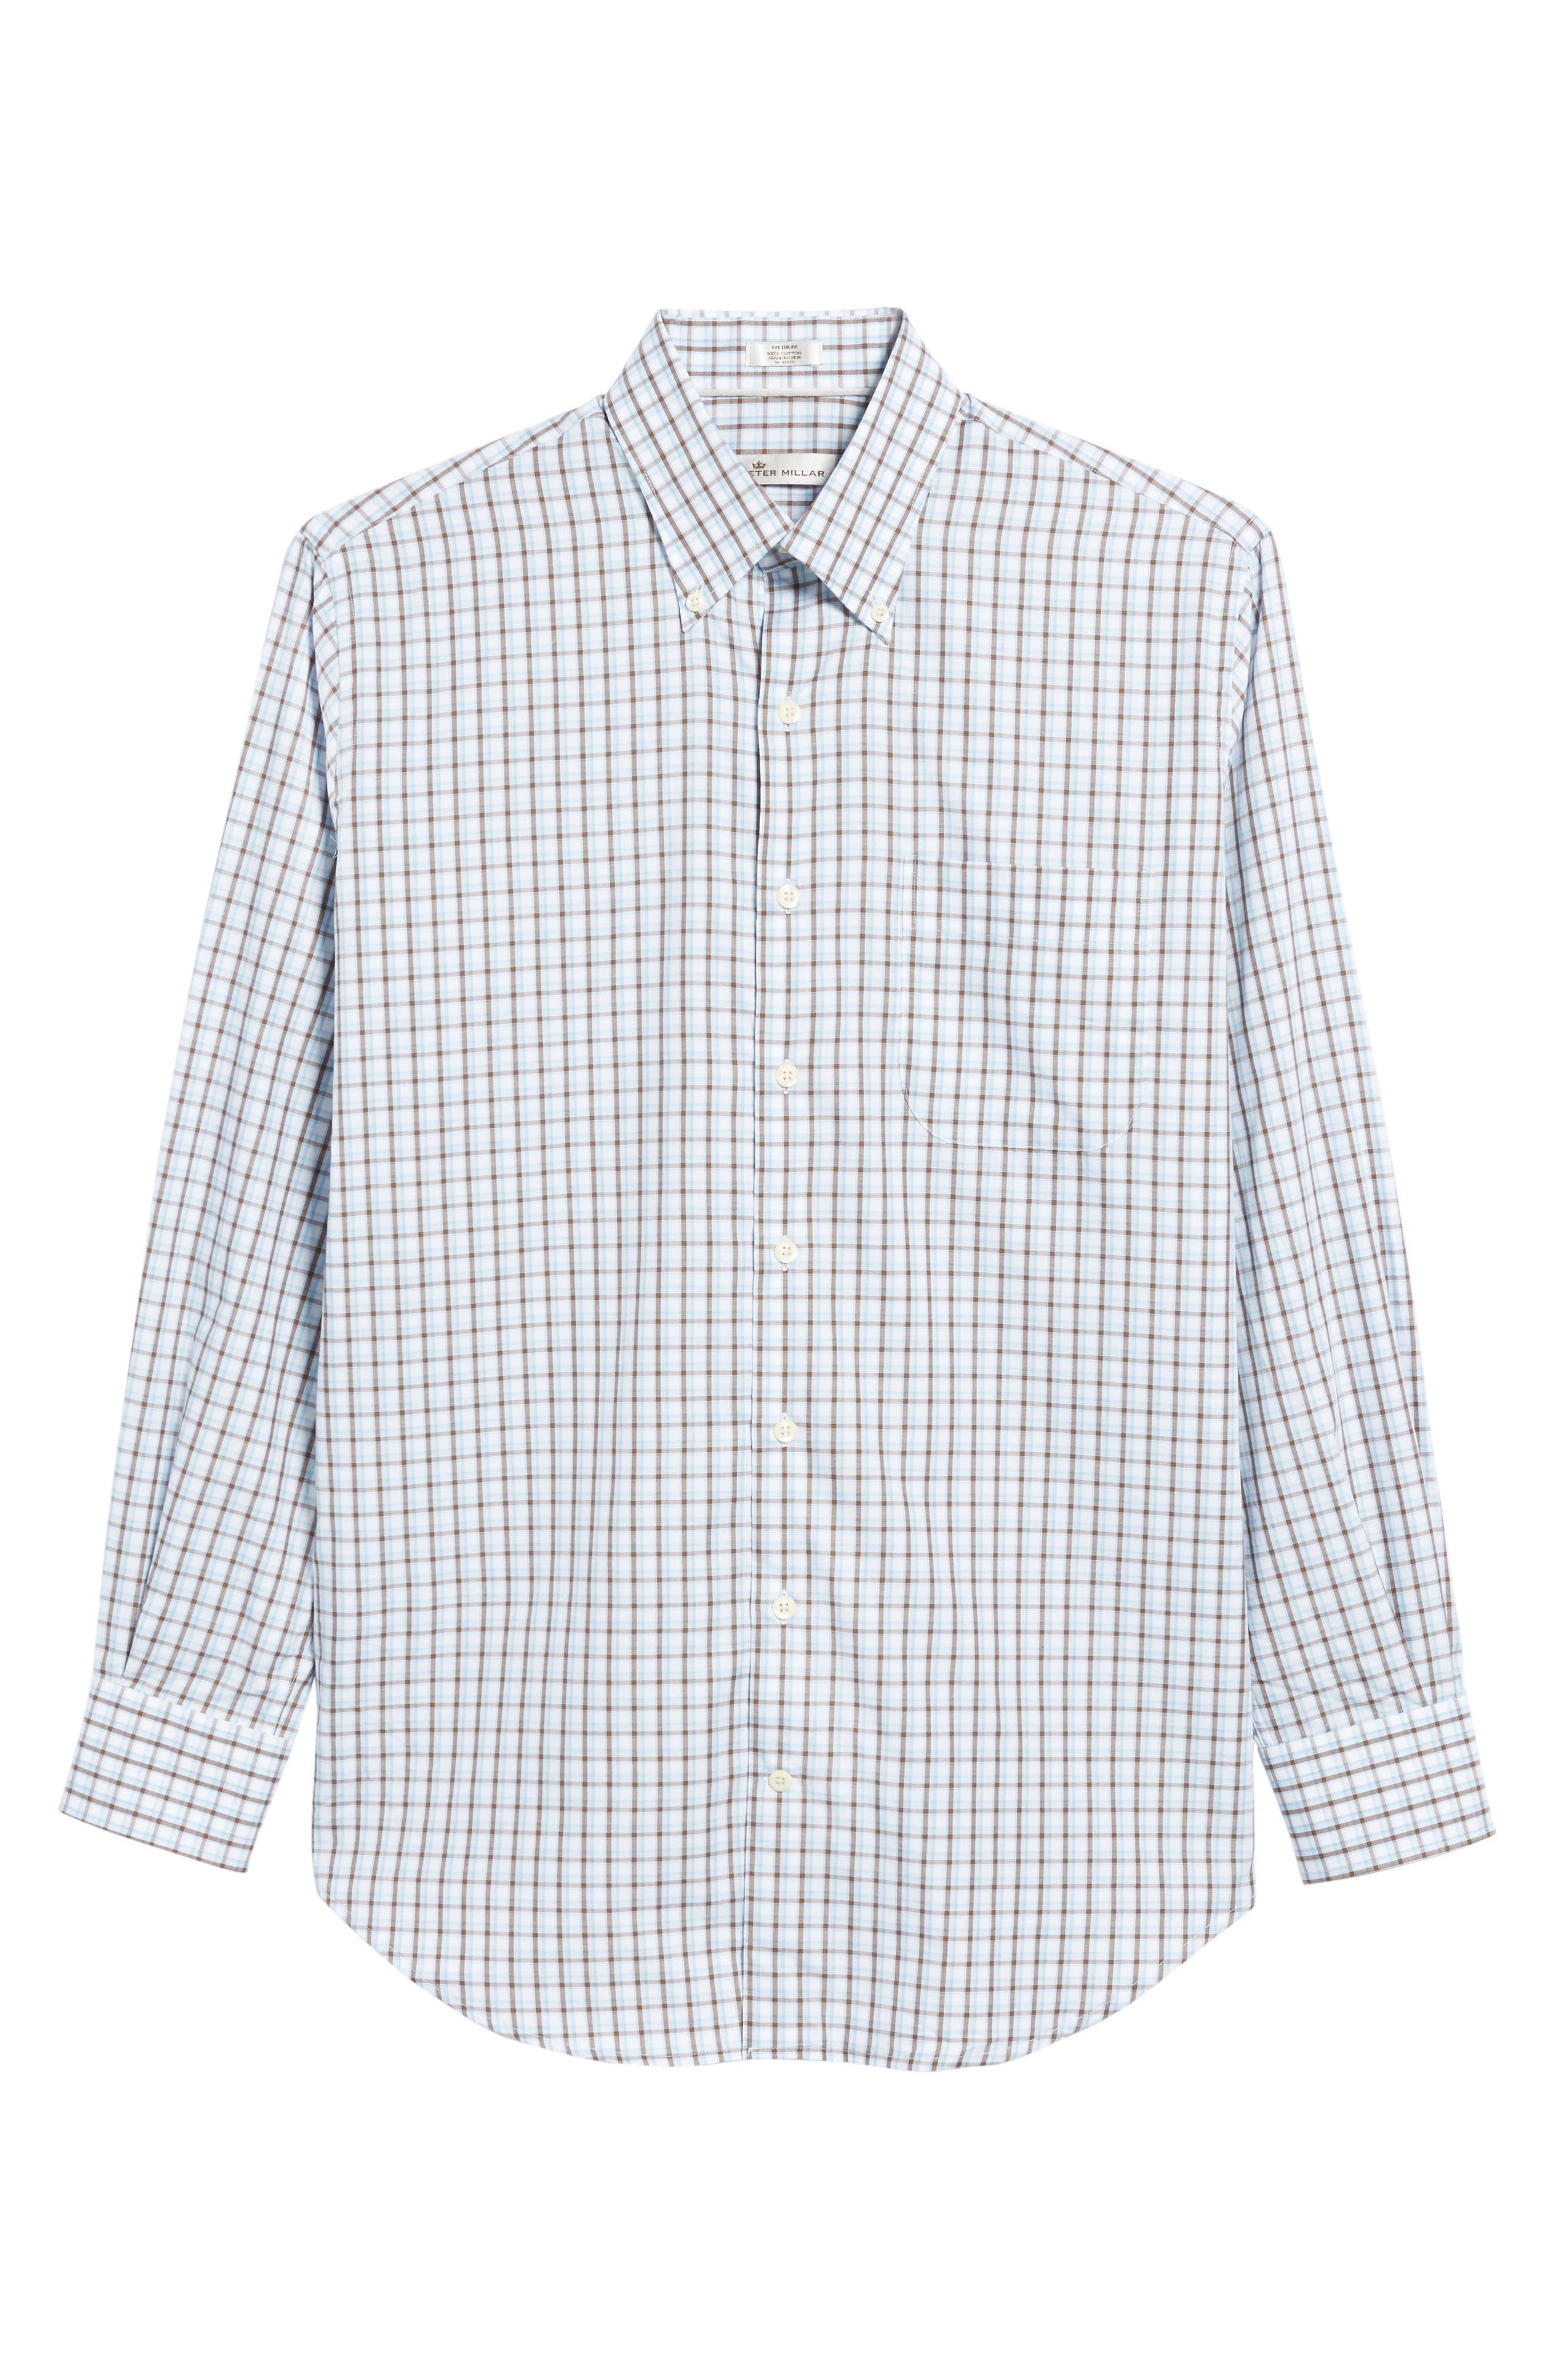 Regular Fit Crisp Pane Sport Shirt,                             Alternate thumbnail 6, color,                             227